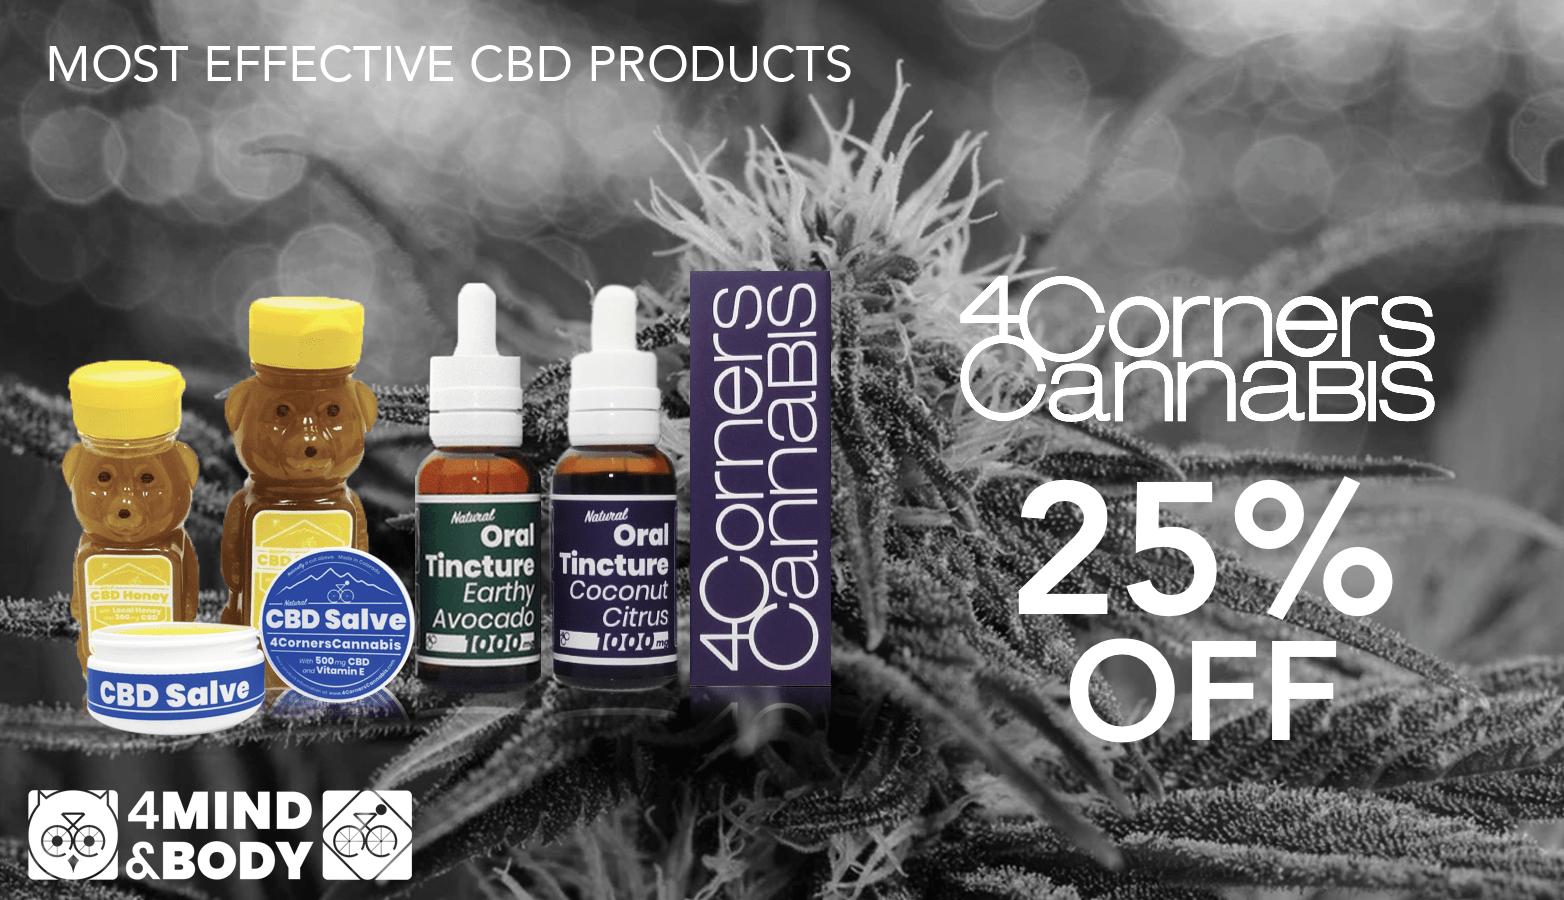 4 Corners Cannabis Coupon - Save On Cannabis